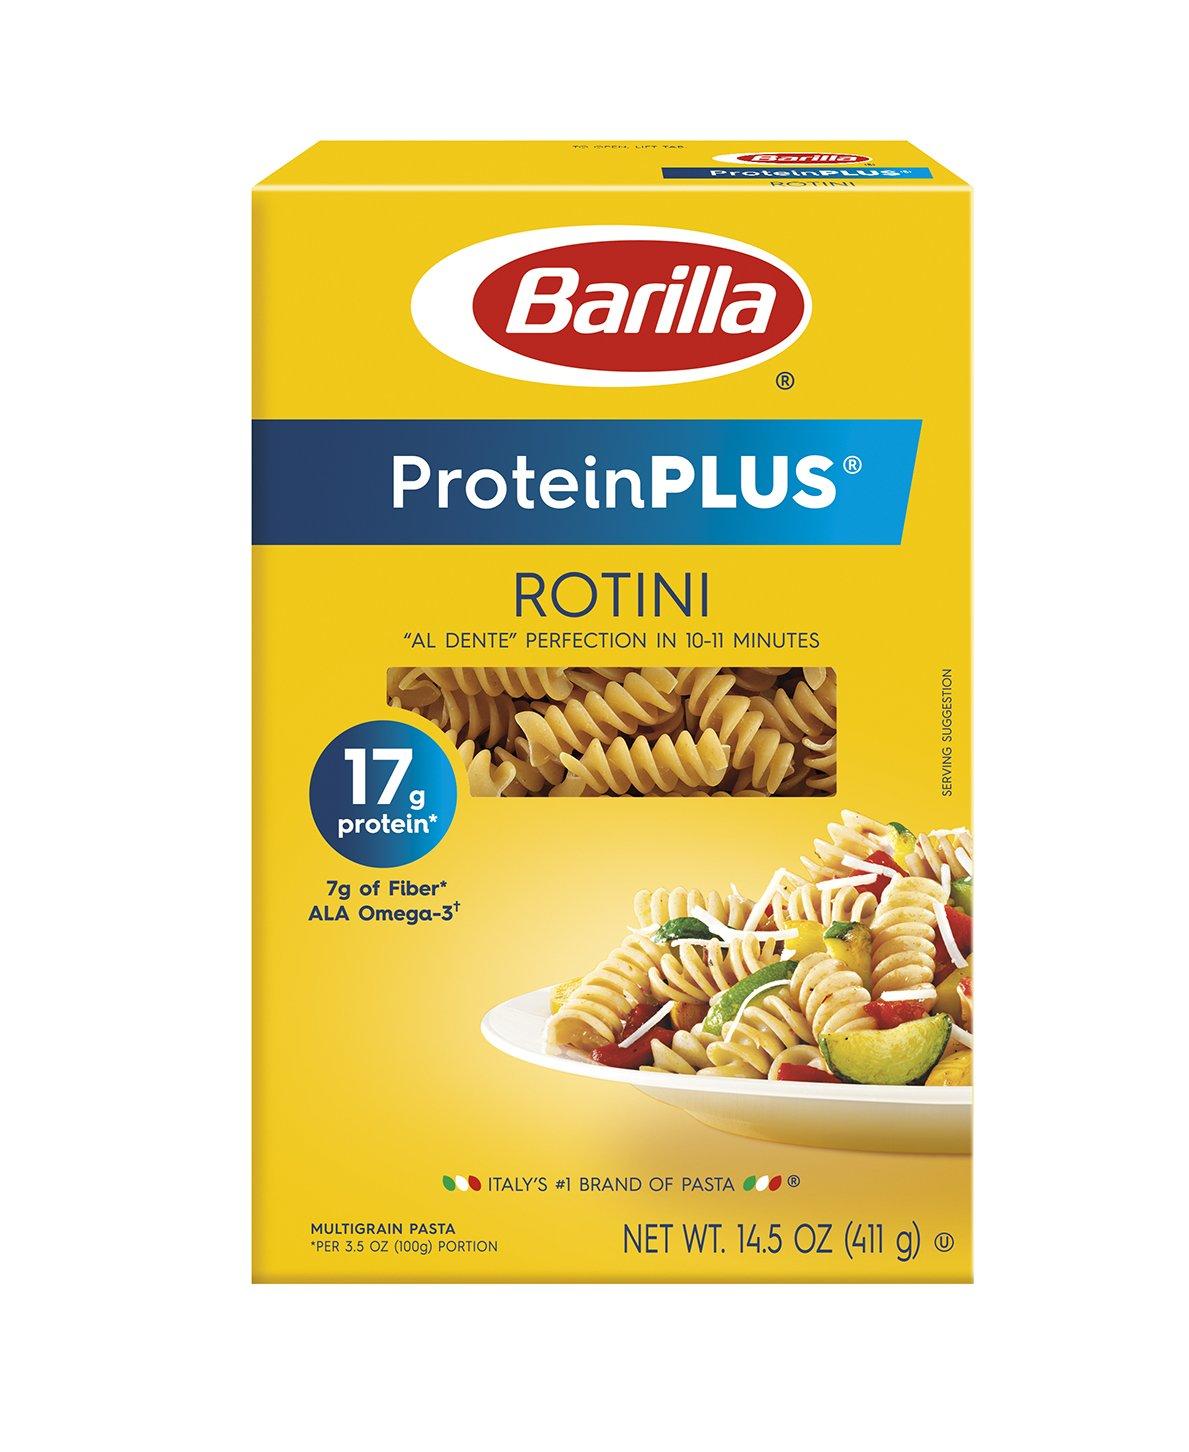 Barilla ProteinPlus Multigrain Pasta, Rotini, 14.5 Ounce (Pack of 8)